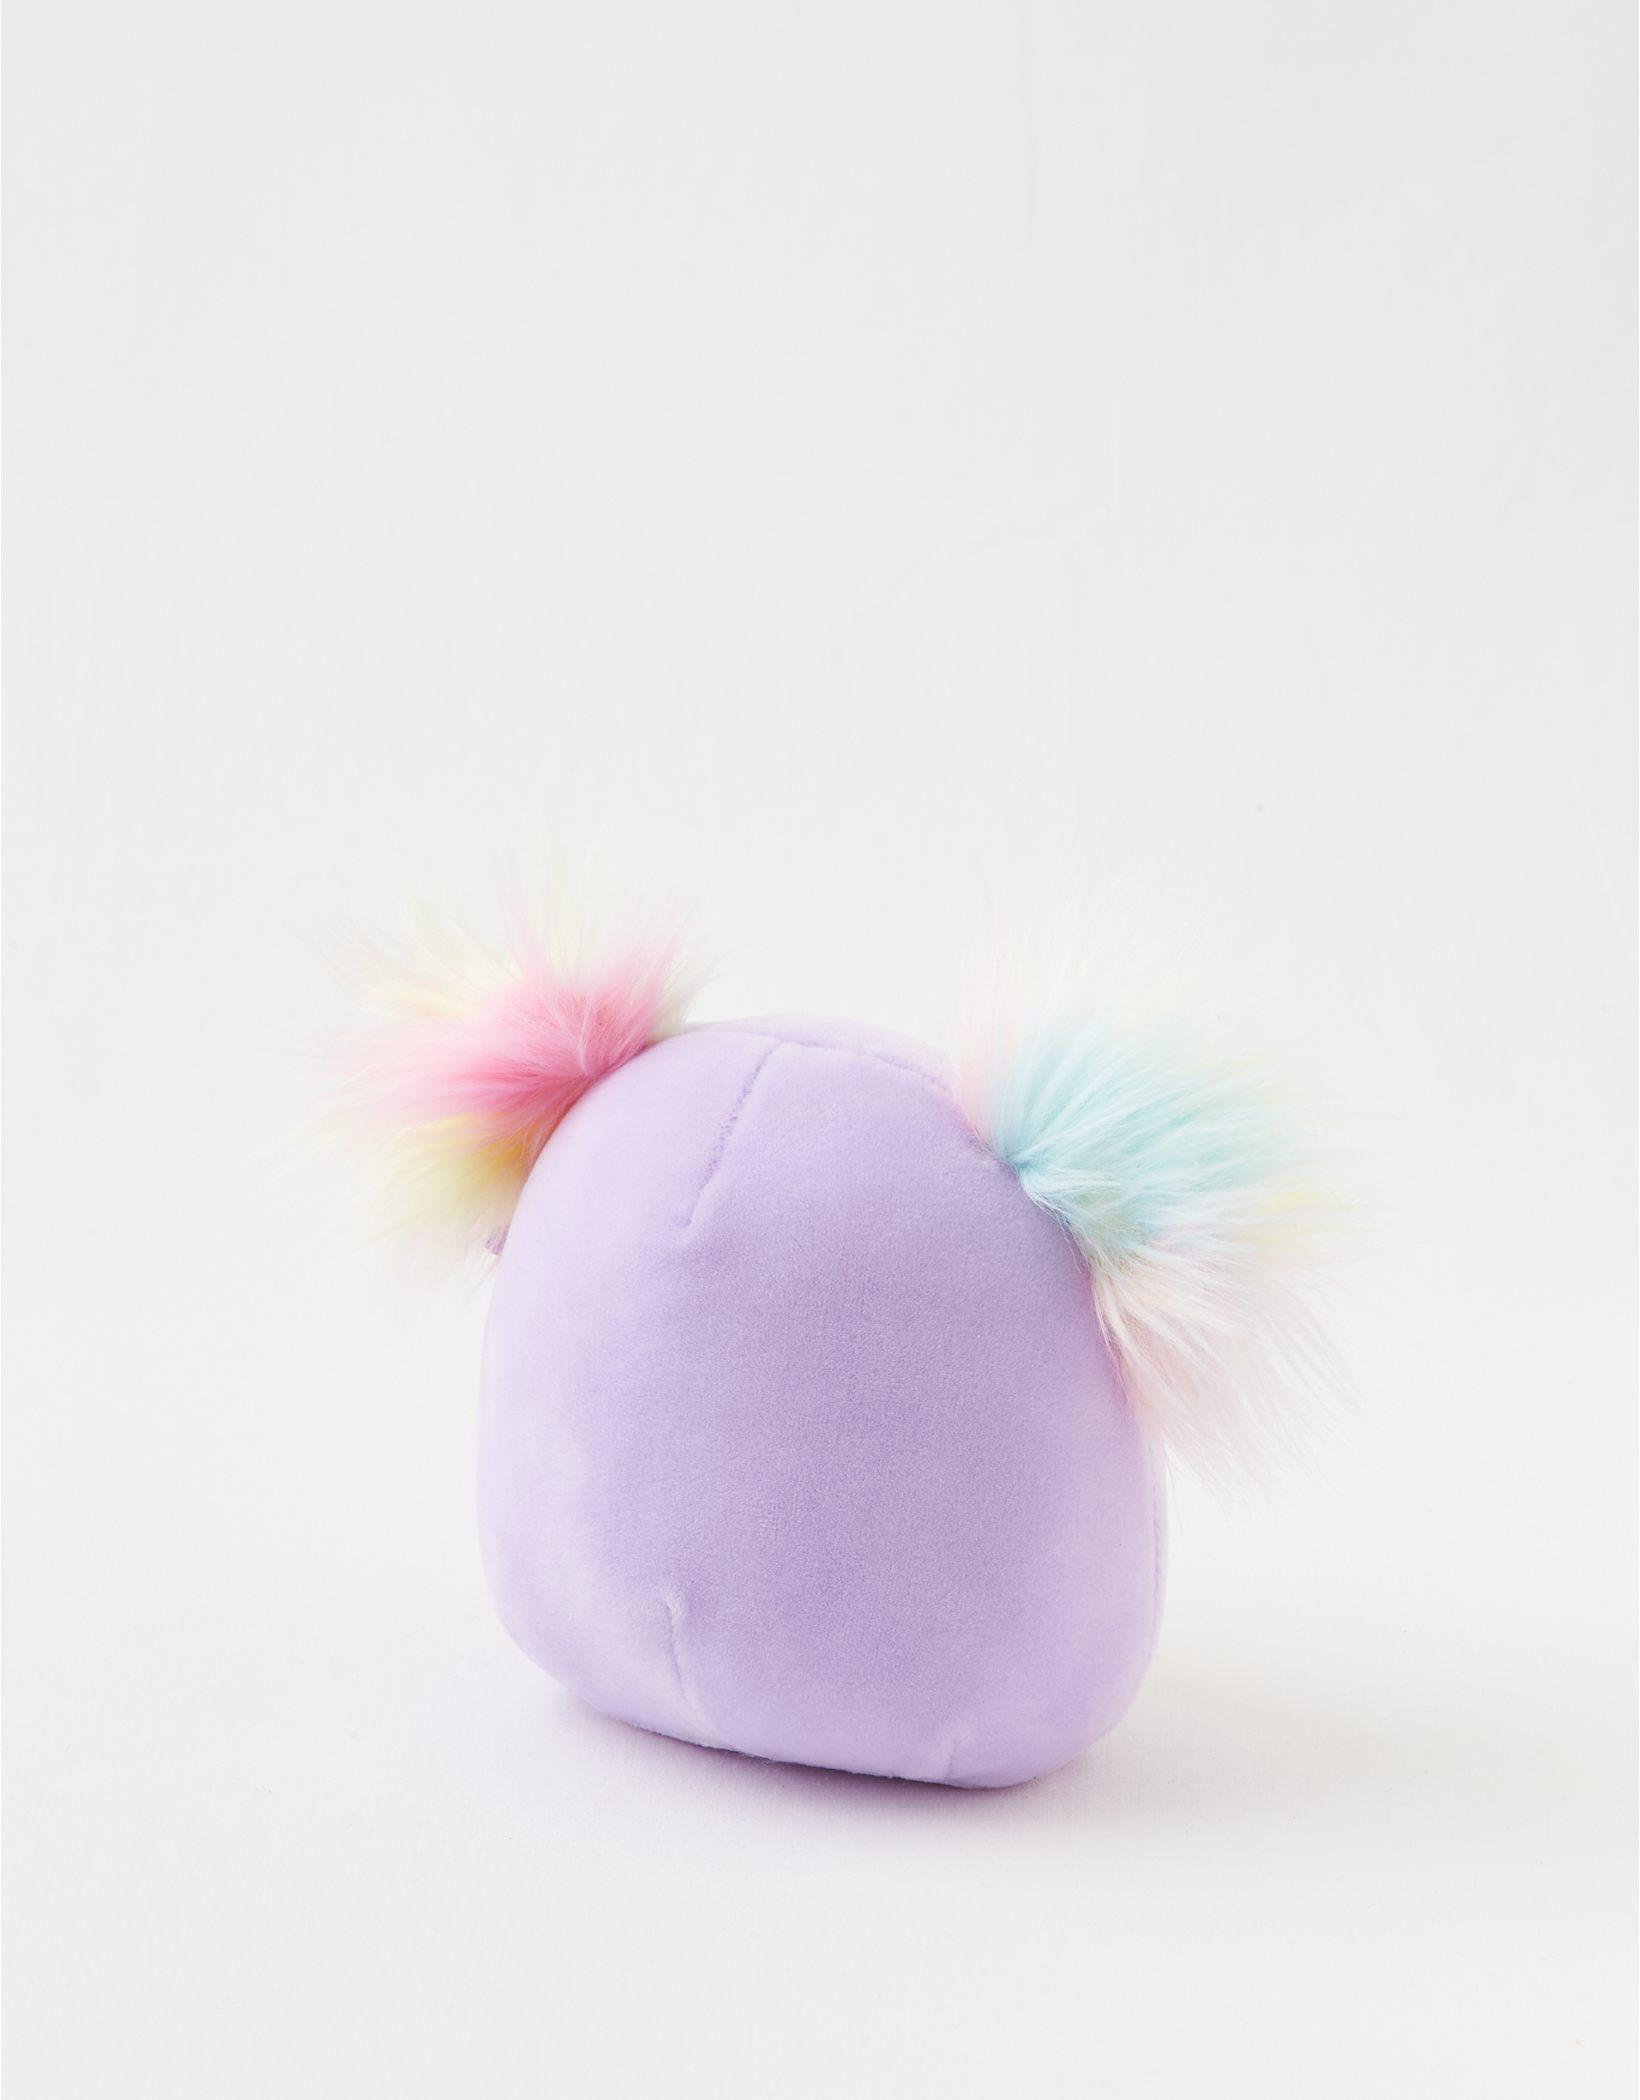 Squishmallow 5 in Plush Toy - Renate